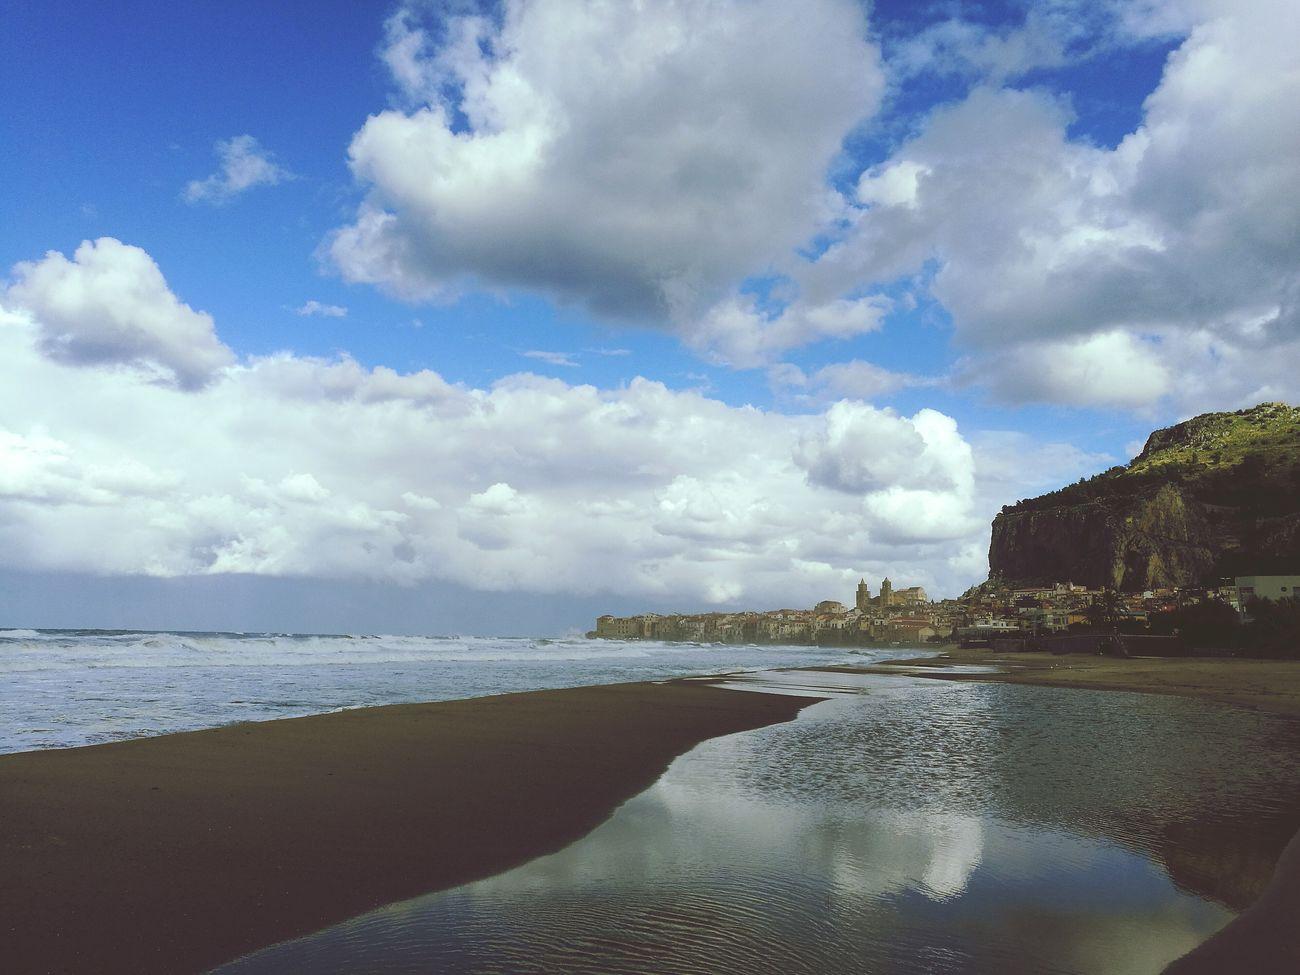 Sea Blue Reflection Sky Horizon Over Water Cefalú, Sicilia, Mare, Paesaggio Travel Destinations Orizzontimeridionali Mare Blue Sky Blue Water Sicily Siciliabedda Historic City Architecture